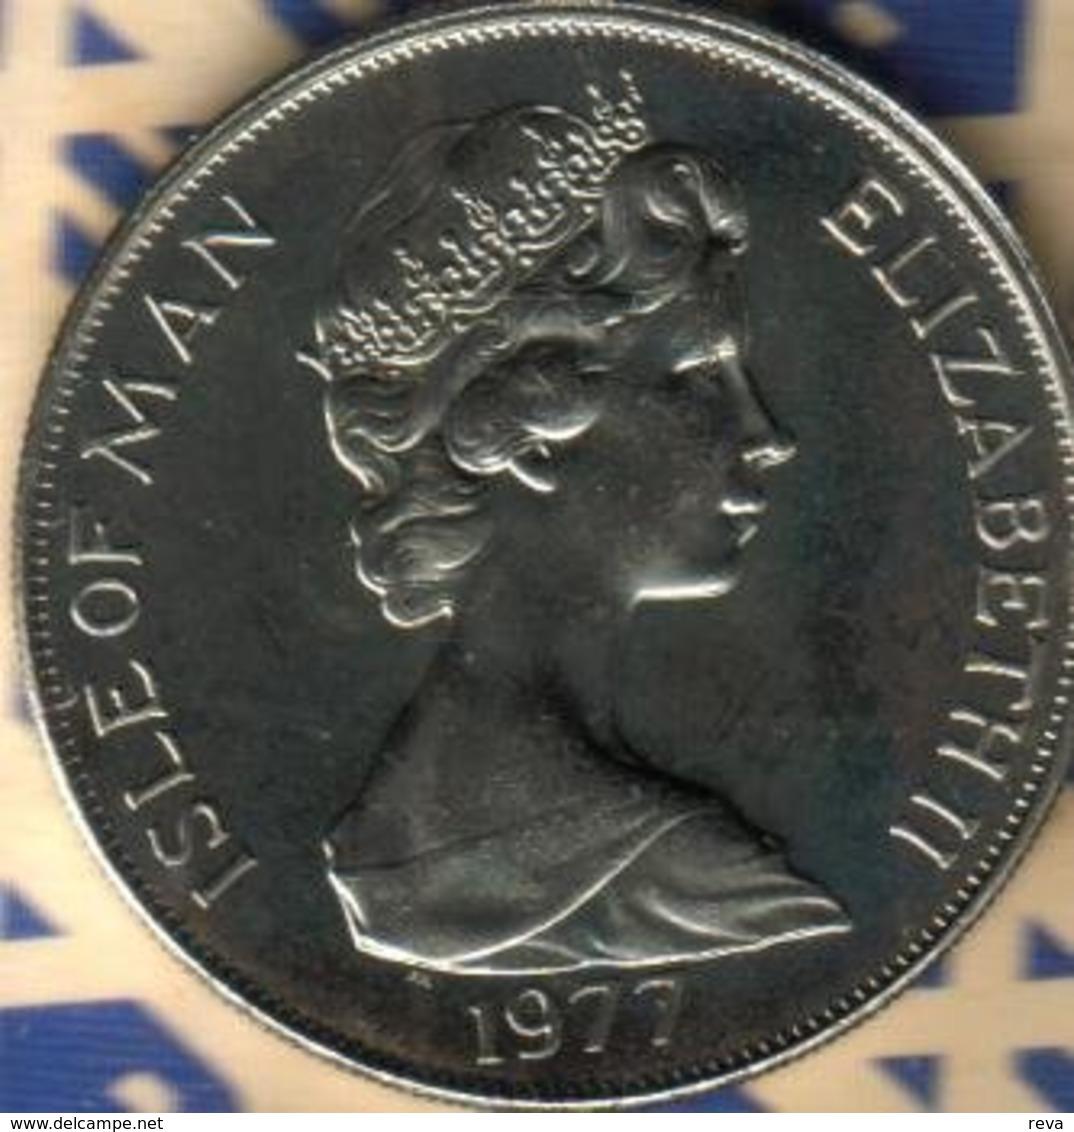 ISLE OF MAN 1 CROWN ROYAL EMBLEMS FRONT QEII HEAD BACK SILVER JUBILEE CORONATION 1977 UNC READ DESCRIPTION CAREFULLY !!! - Regionale Währungen